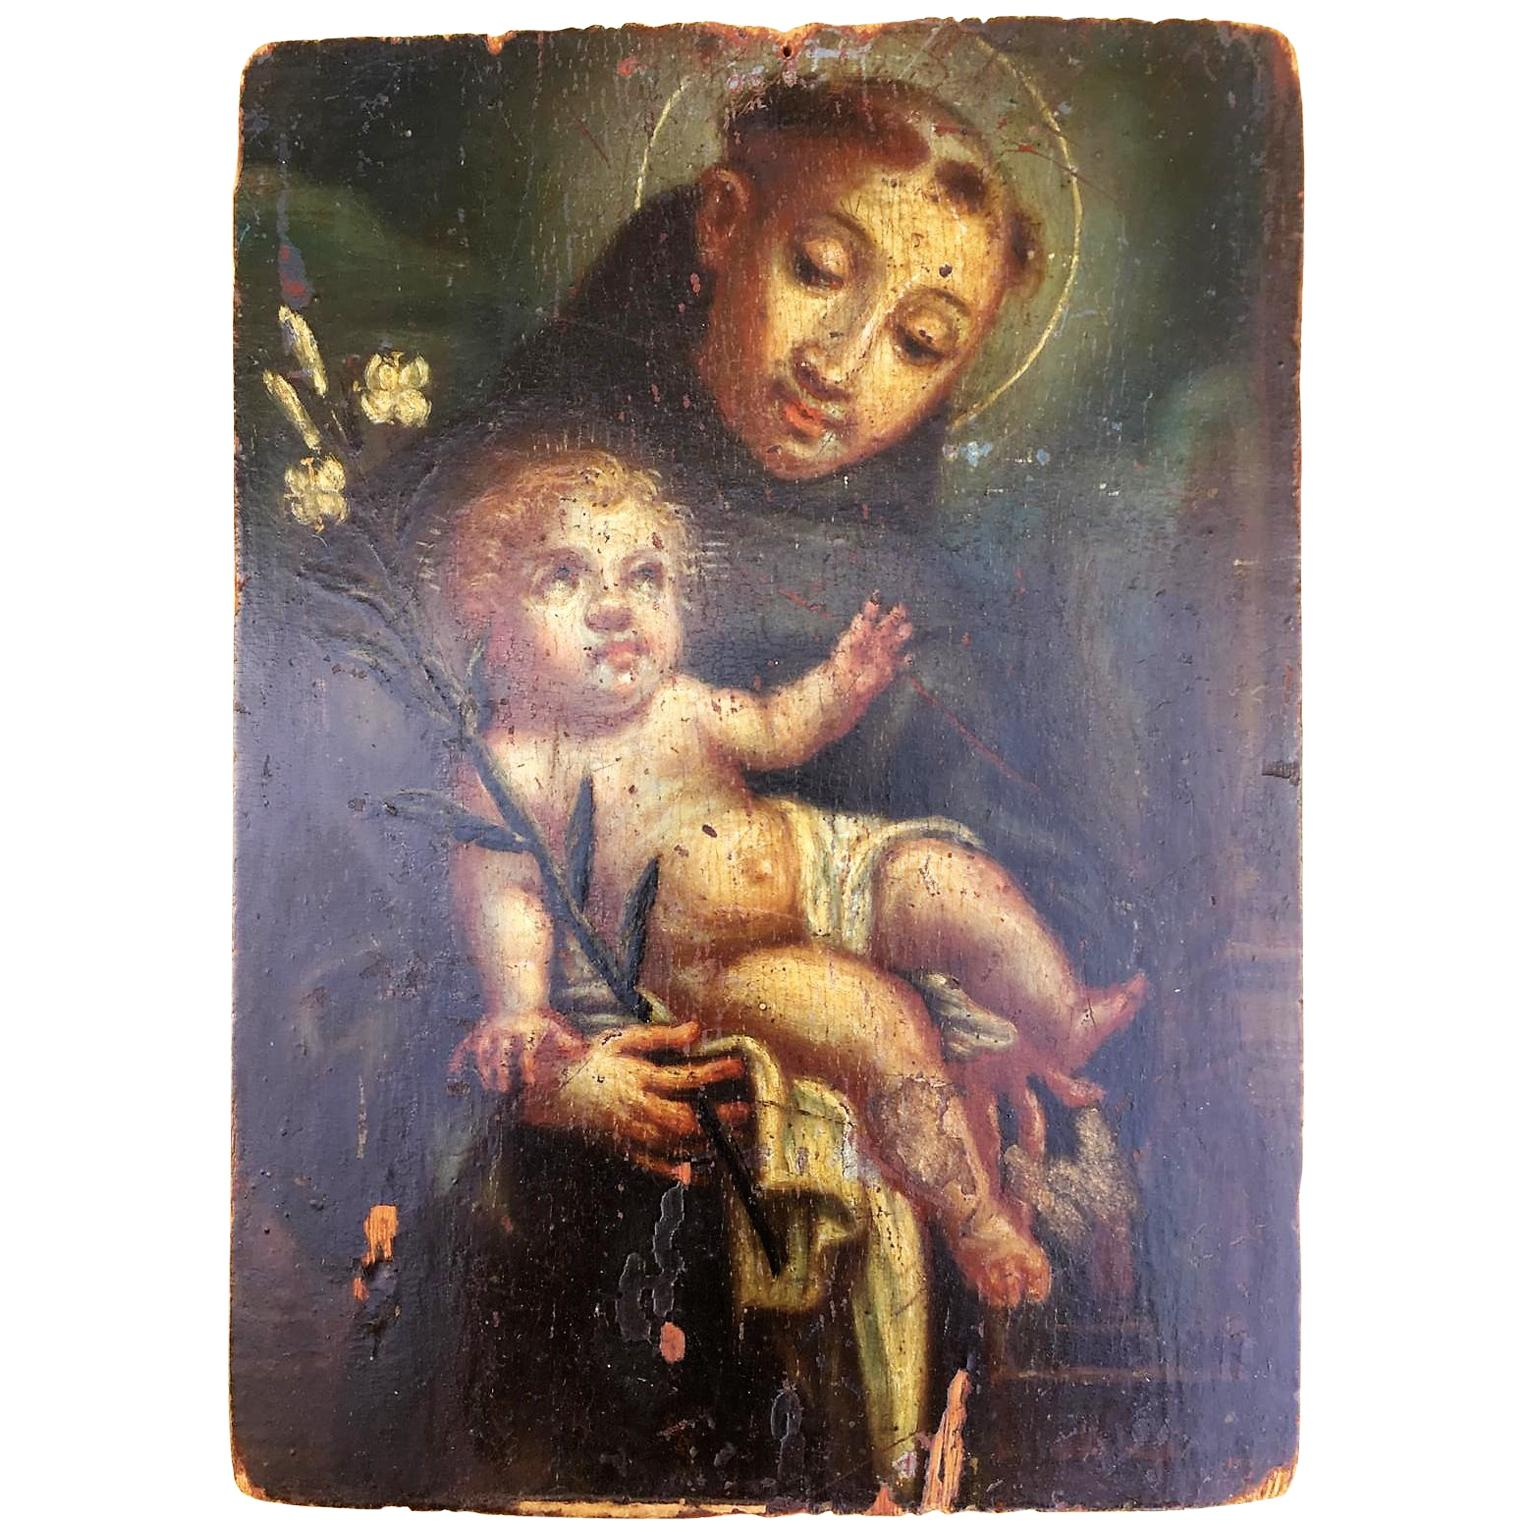 Original Oil on Wood Panel of St. Anthony of Padua